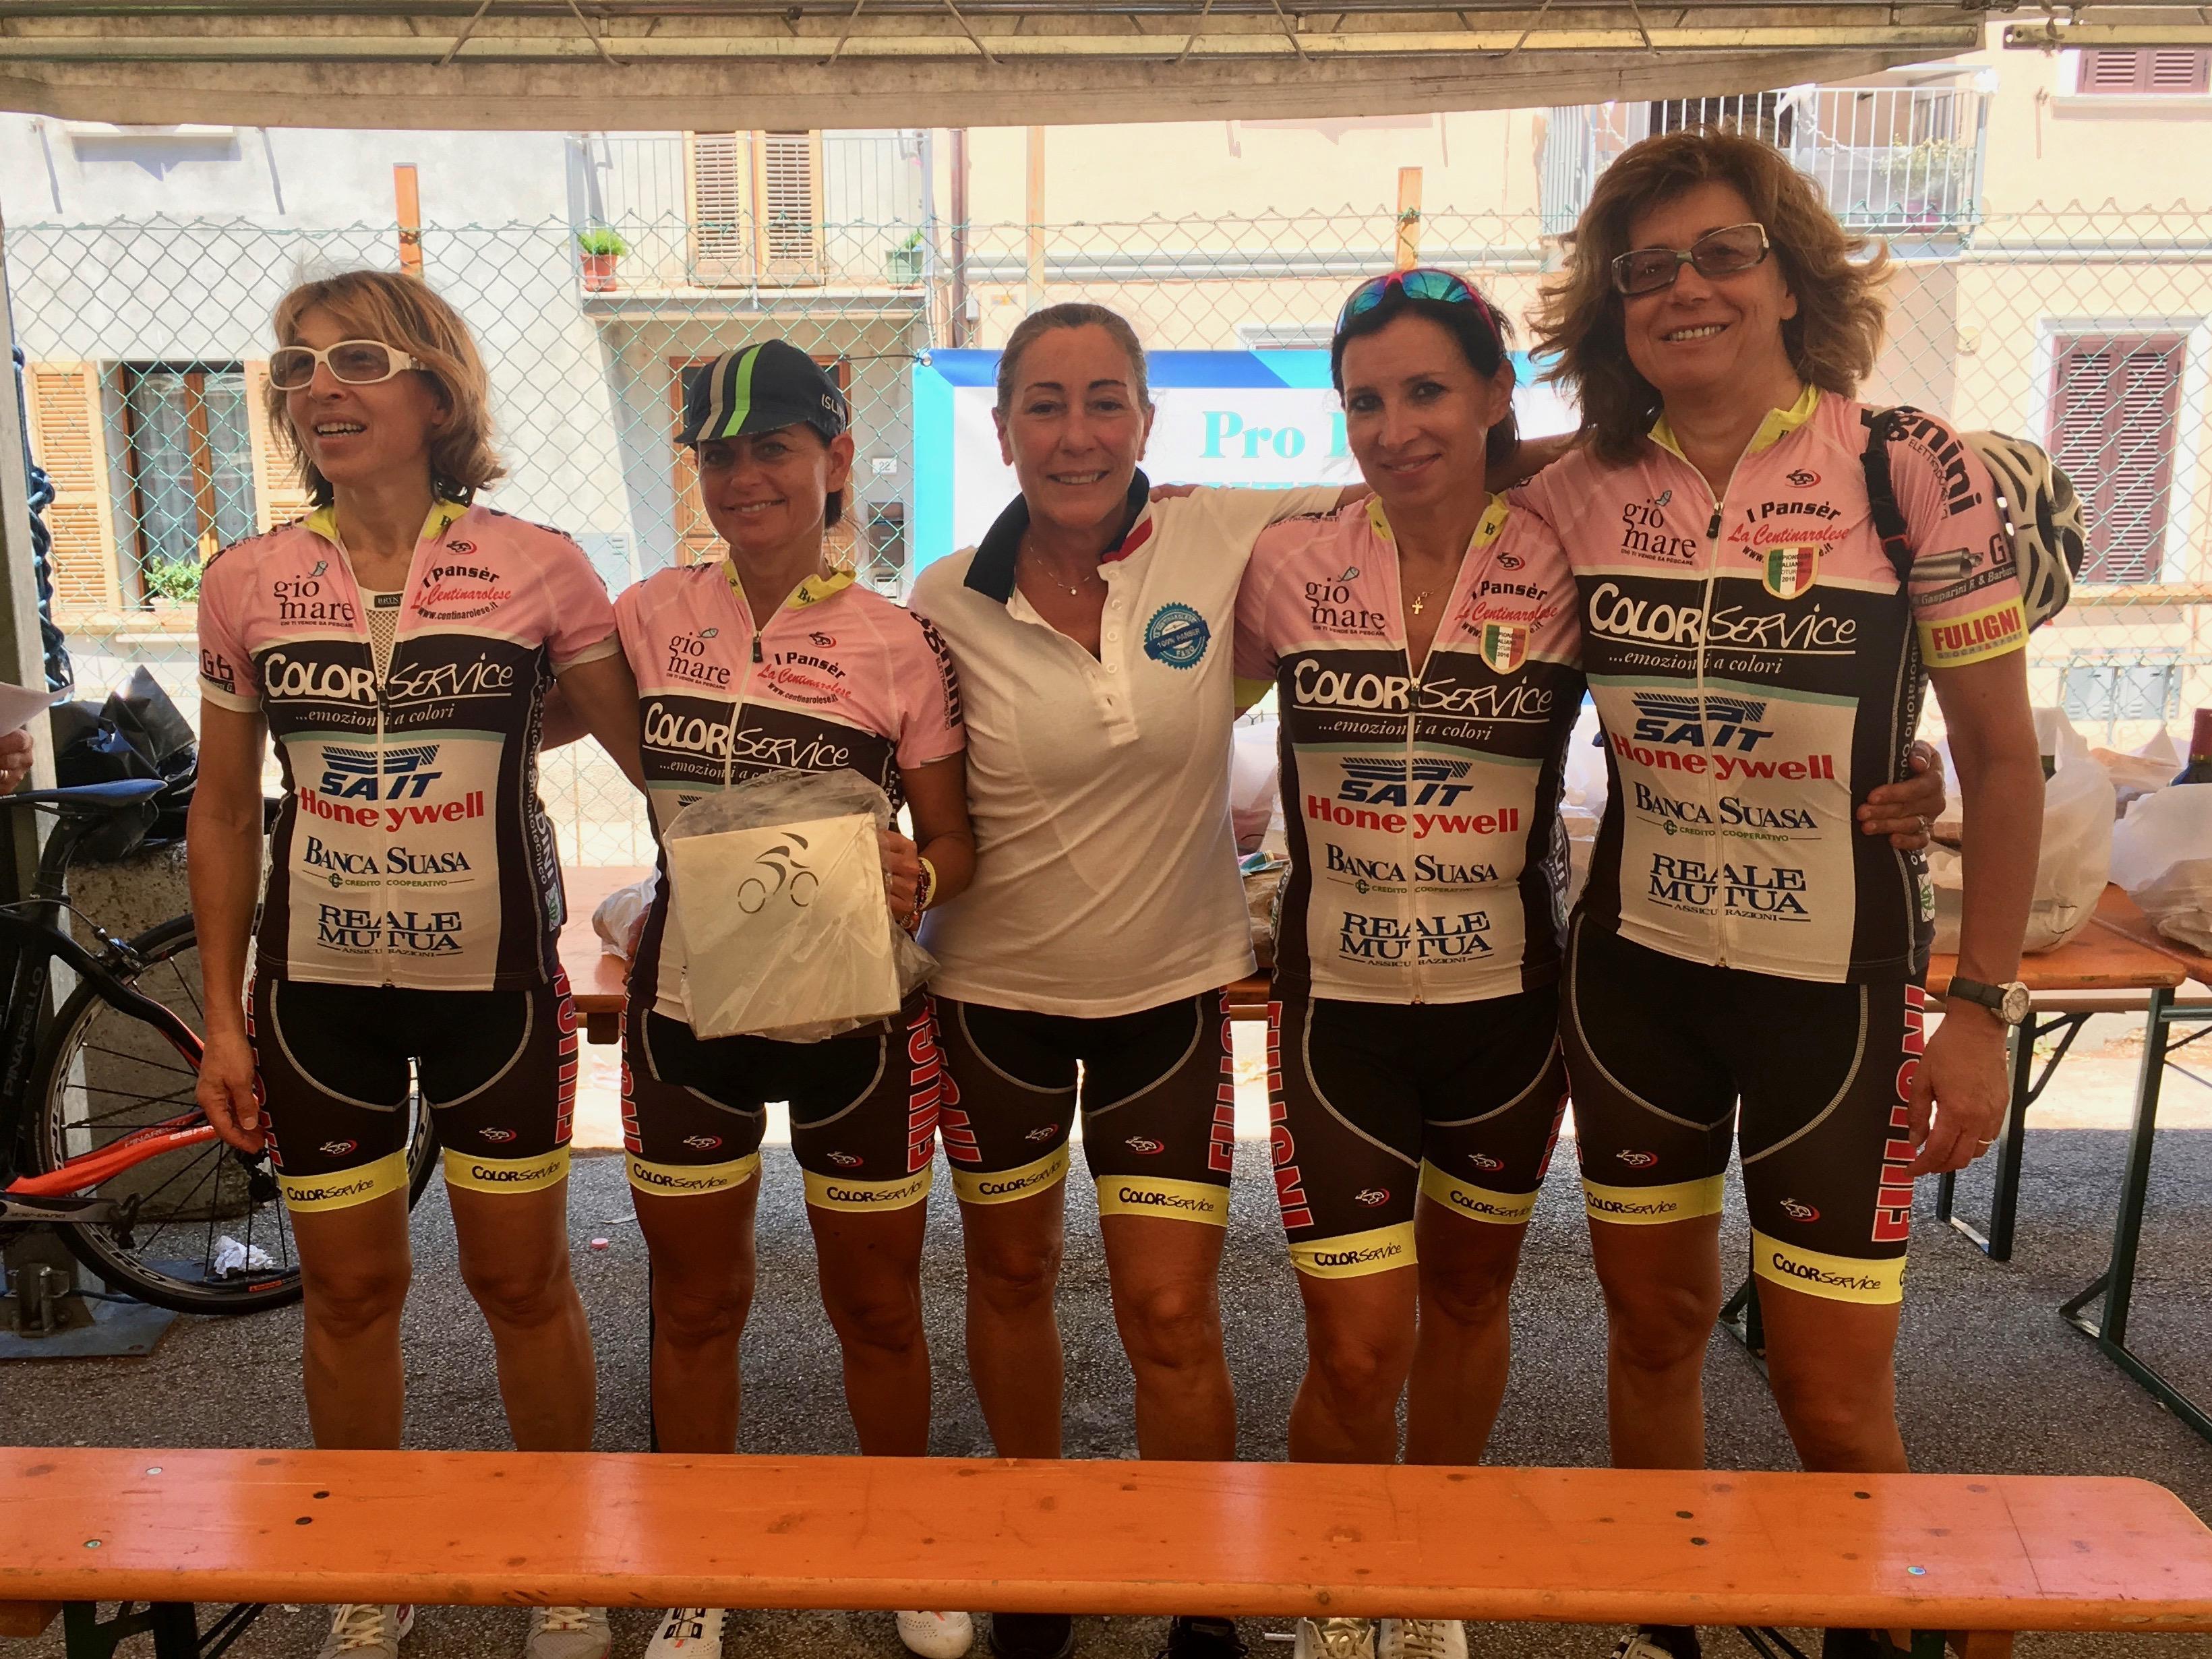 ACSI PU Calendario Stagione Ciclista 2019